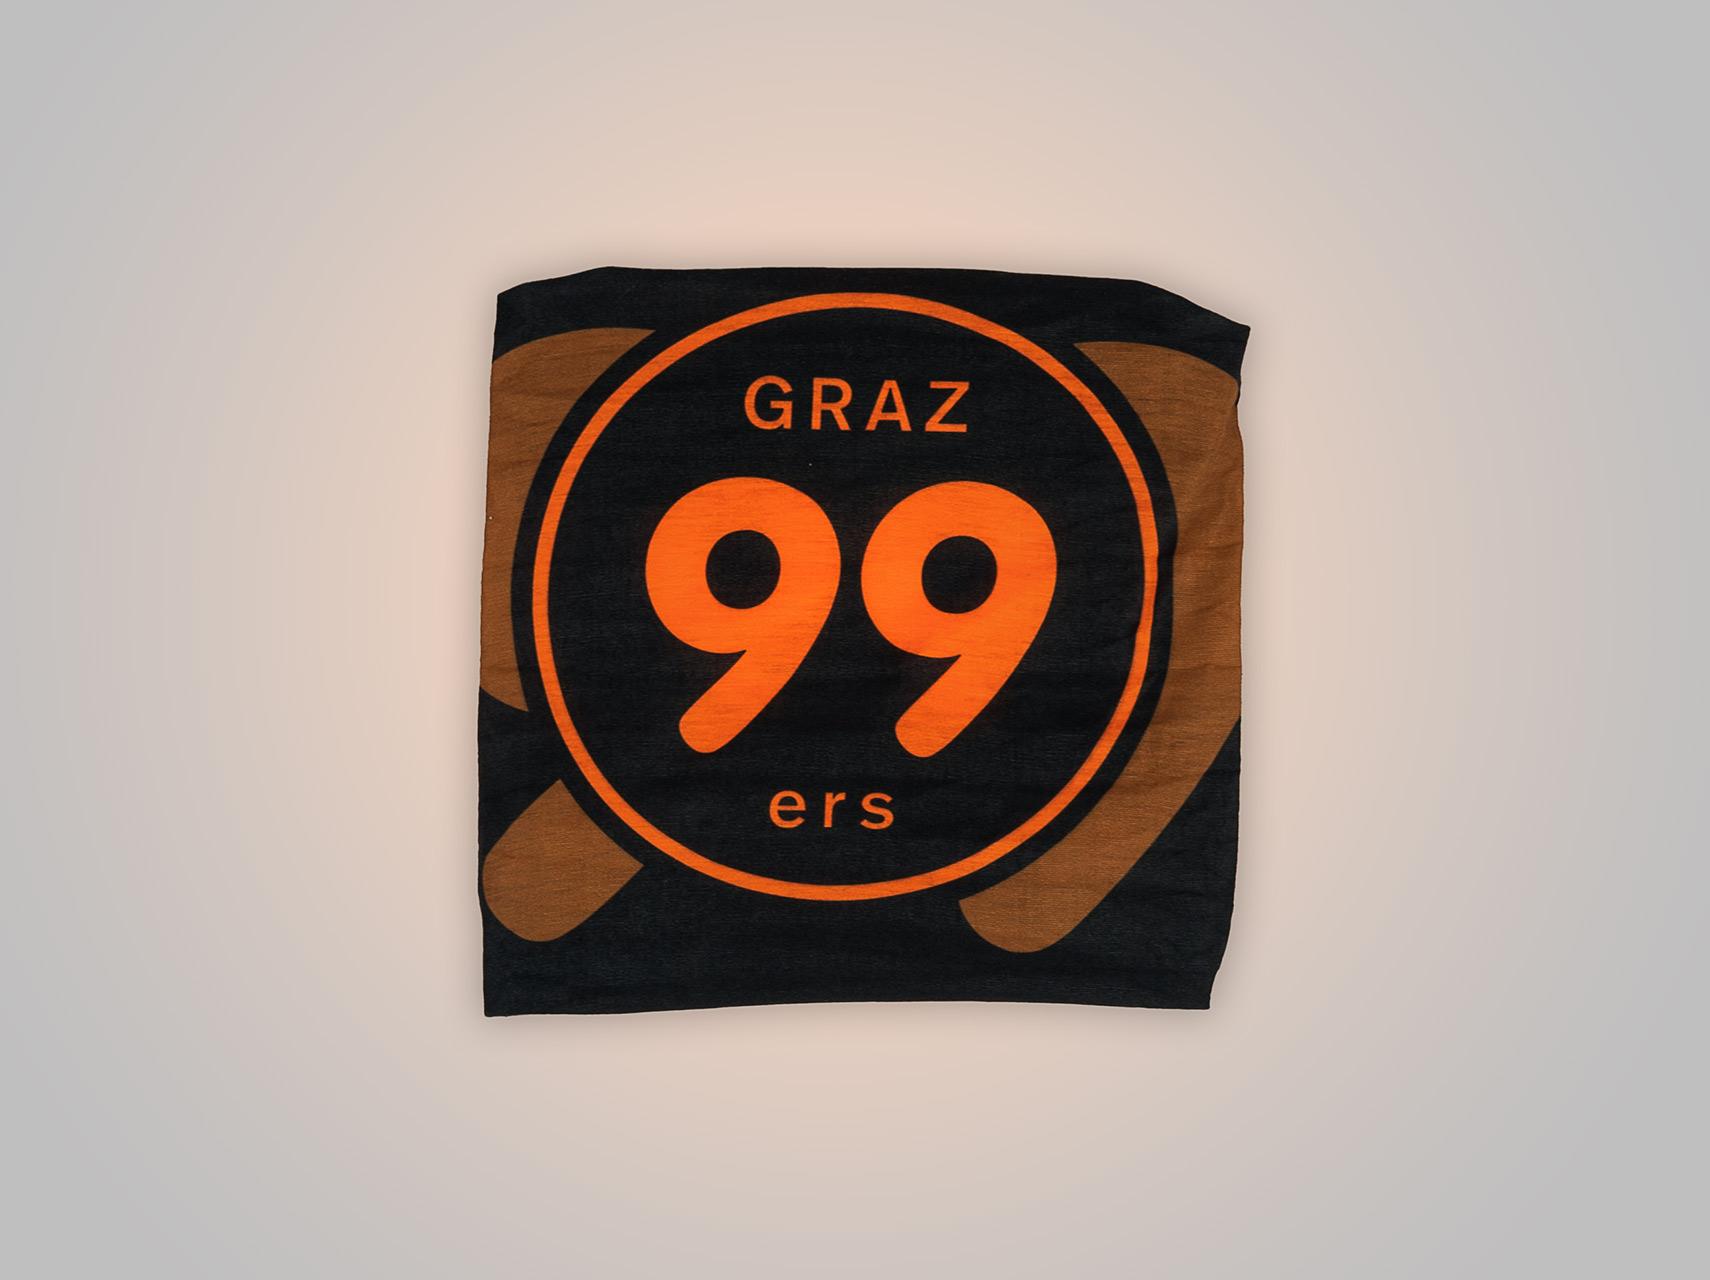 Graz99ers Onlineshop - Multifunktionstuch